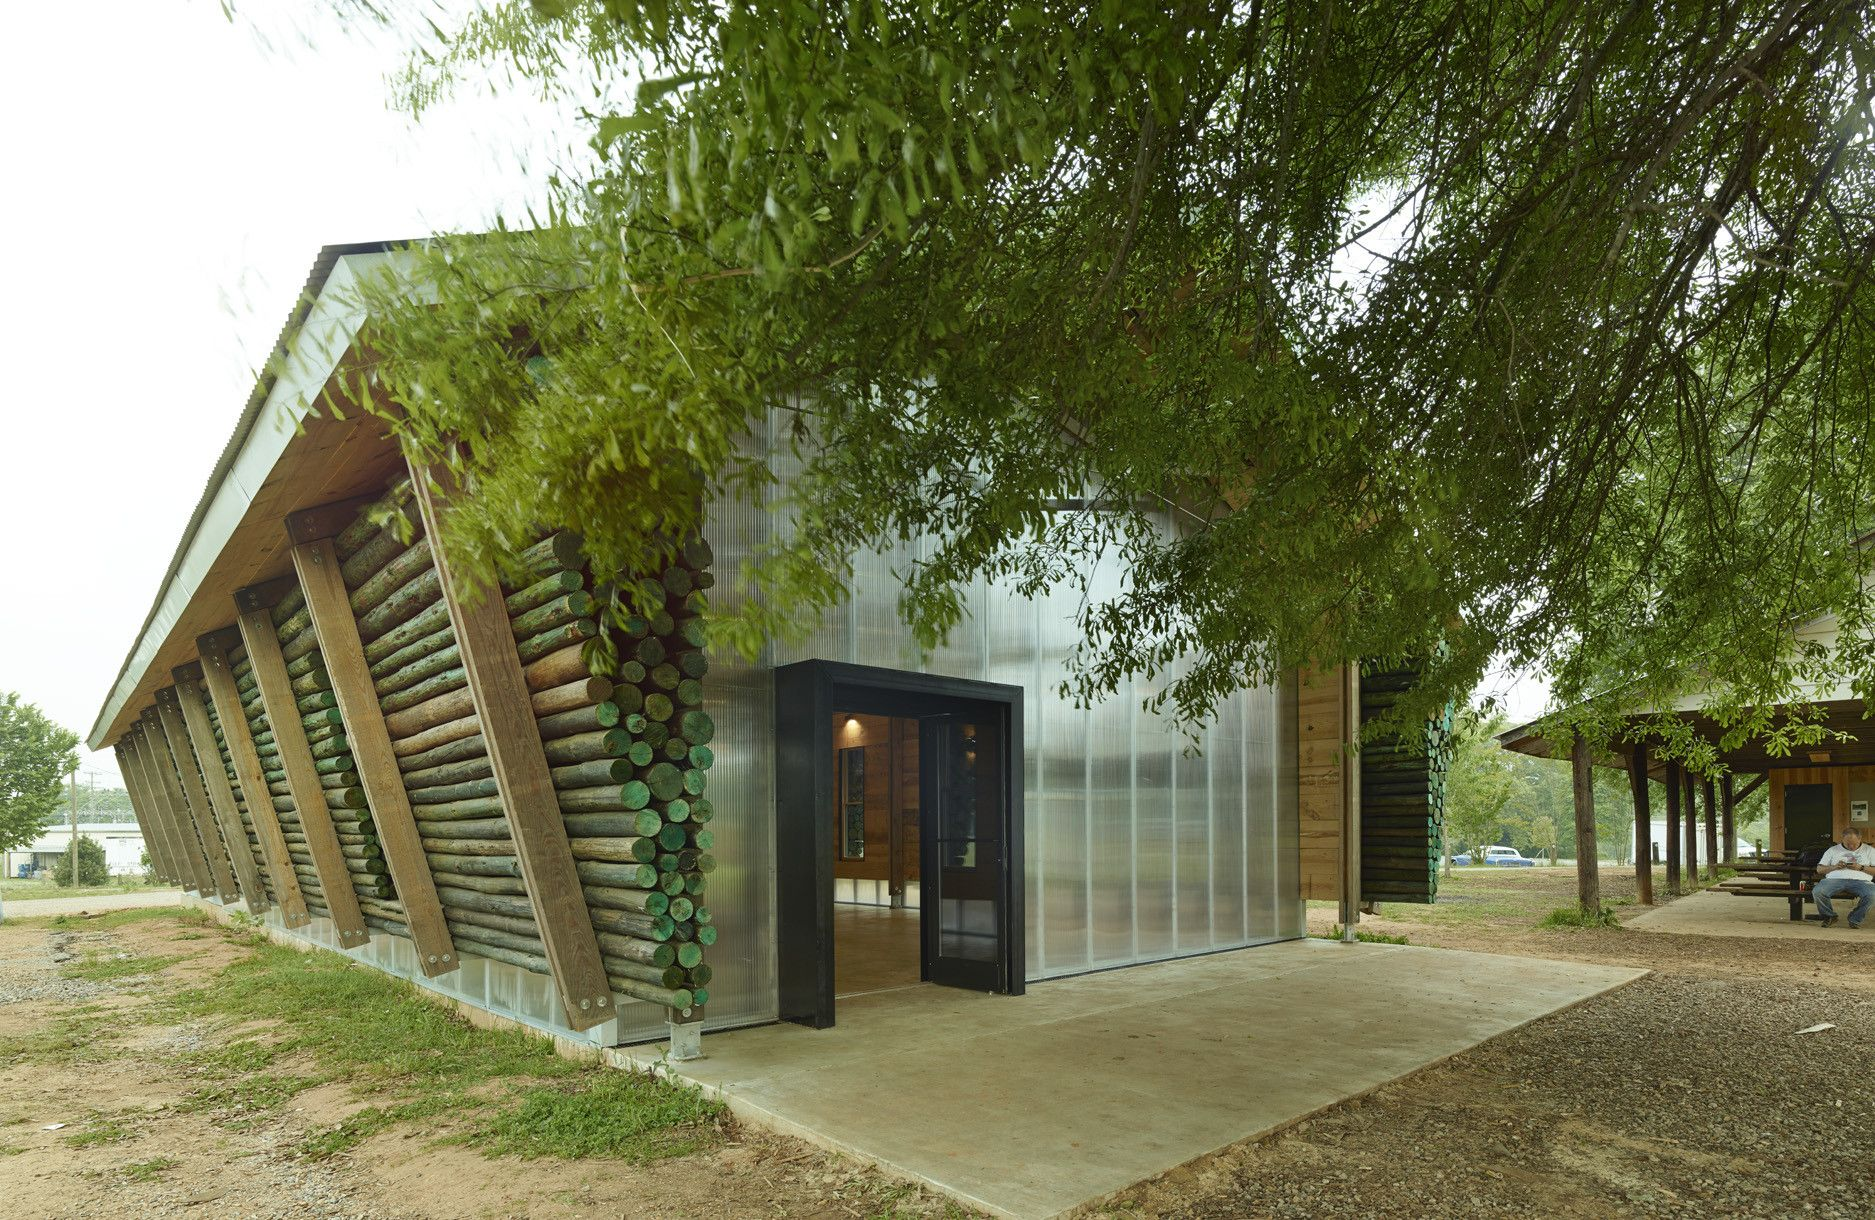 Galería de Scouts en Parque Lions / Auburn University Rural Studio ...